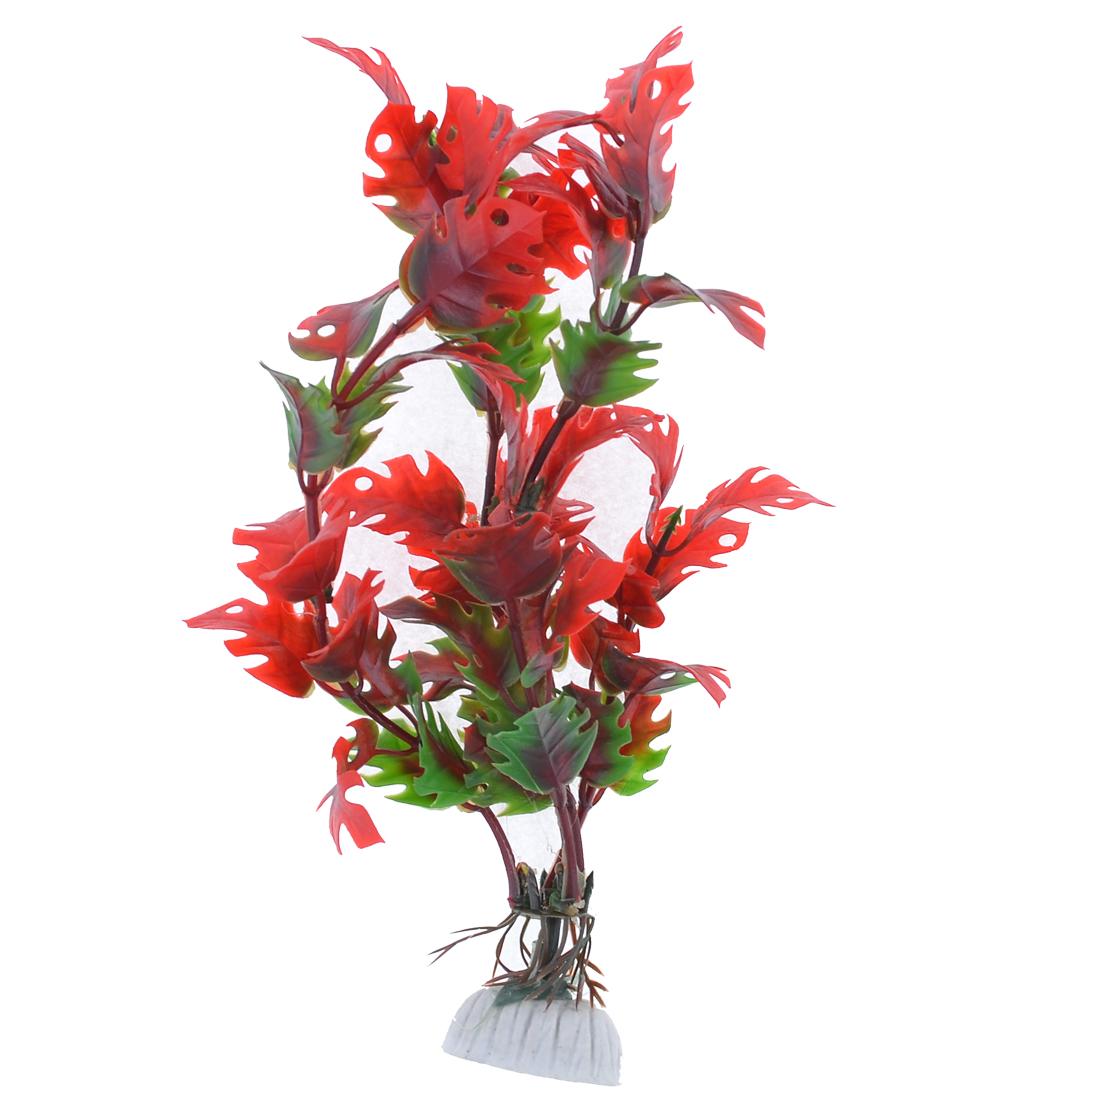 "Aquarium Landscaping Green Red 7.9"" Long Banana Leaf Plastic Plants"